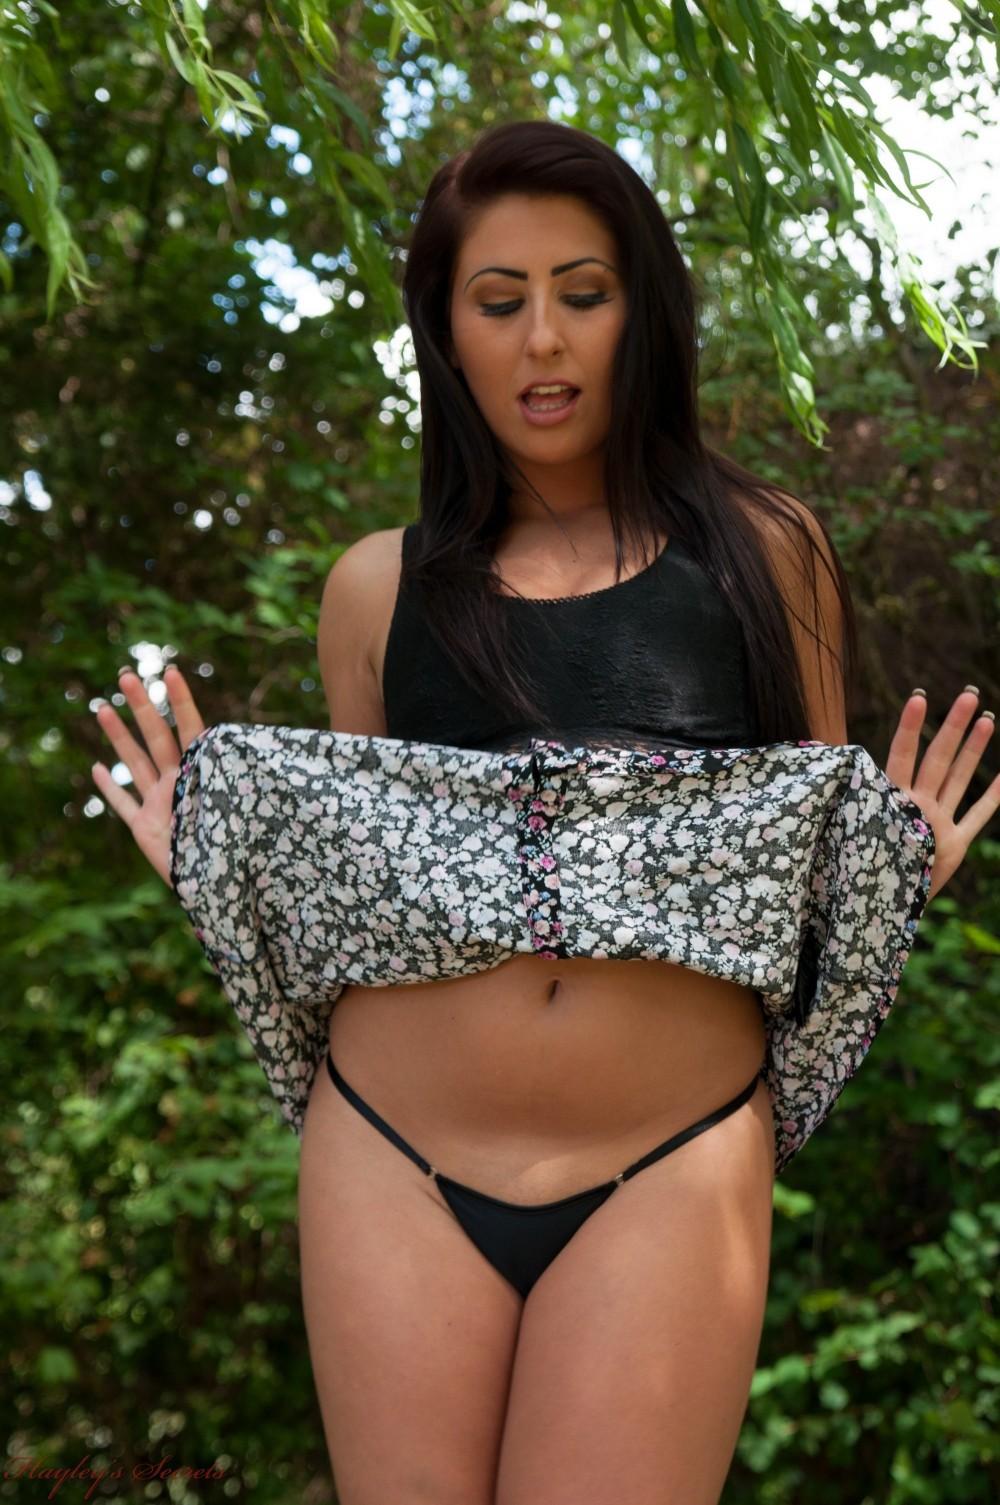 veronica brazil vulva